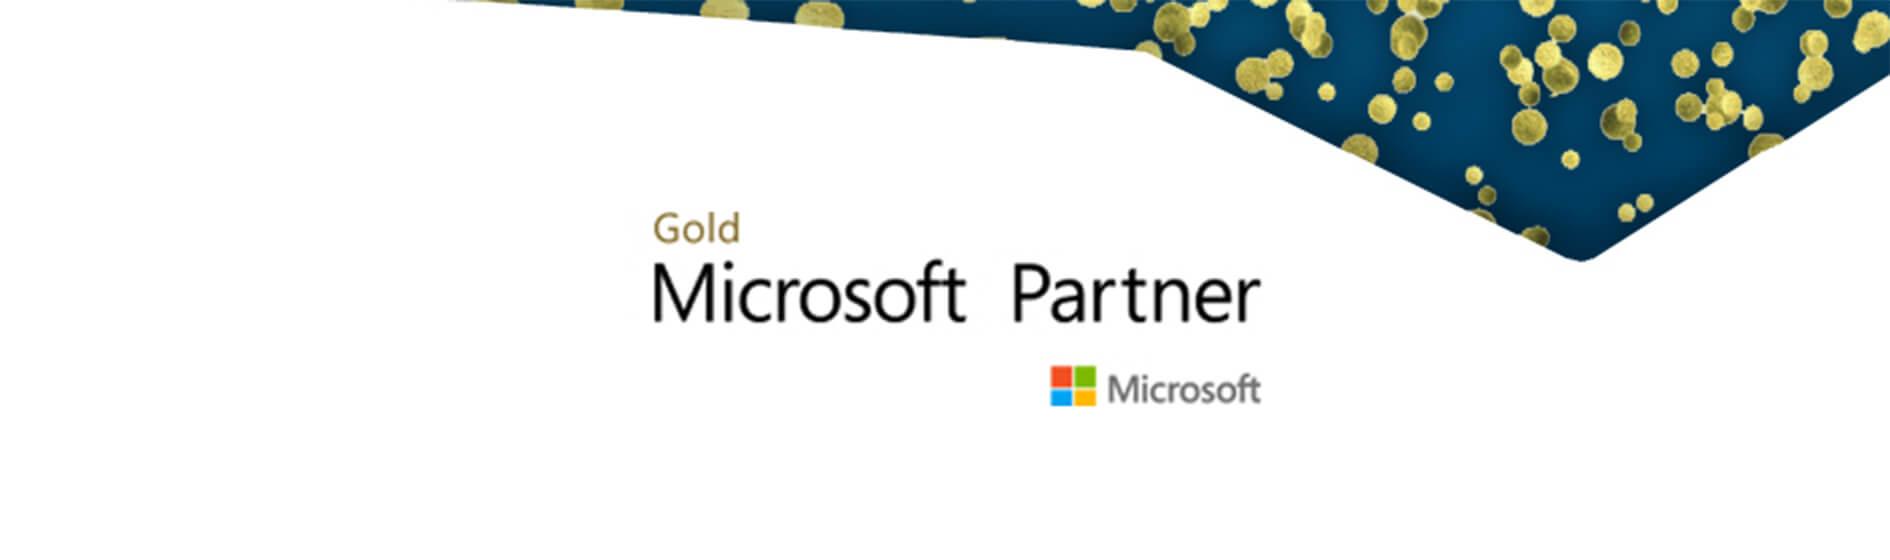 Elite Dynamics becomes a Gold Microsoft Partner